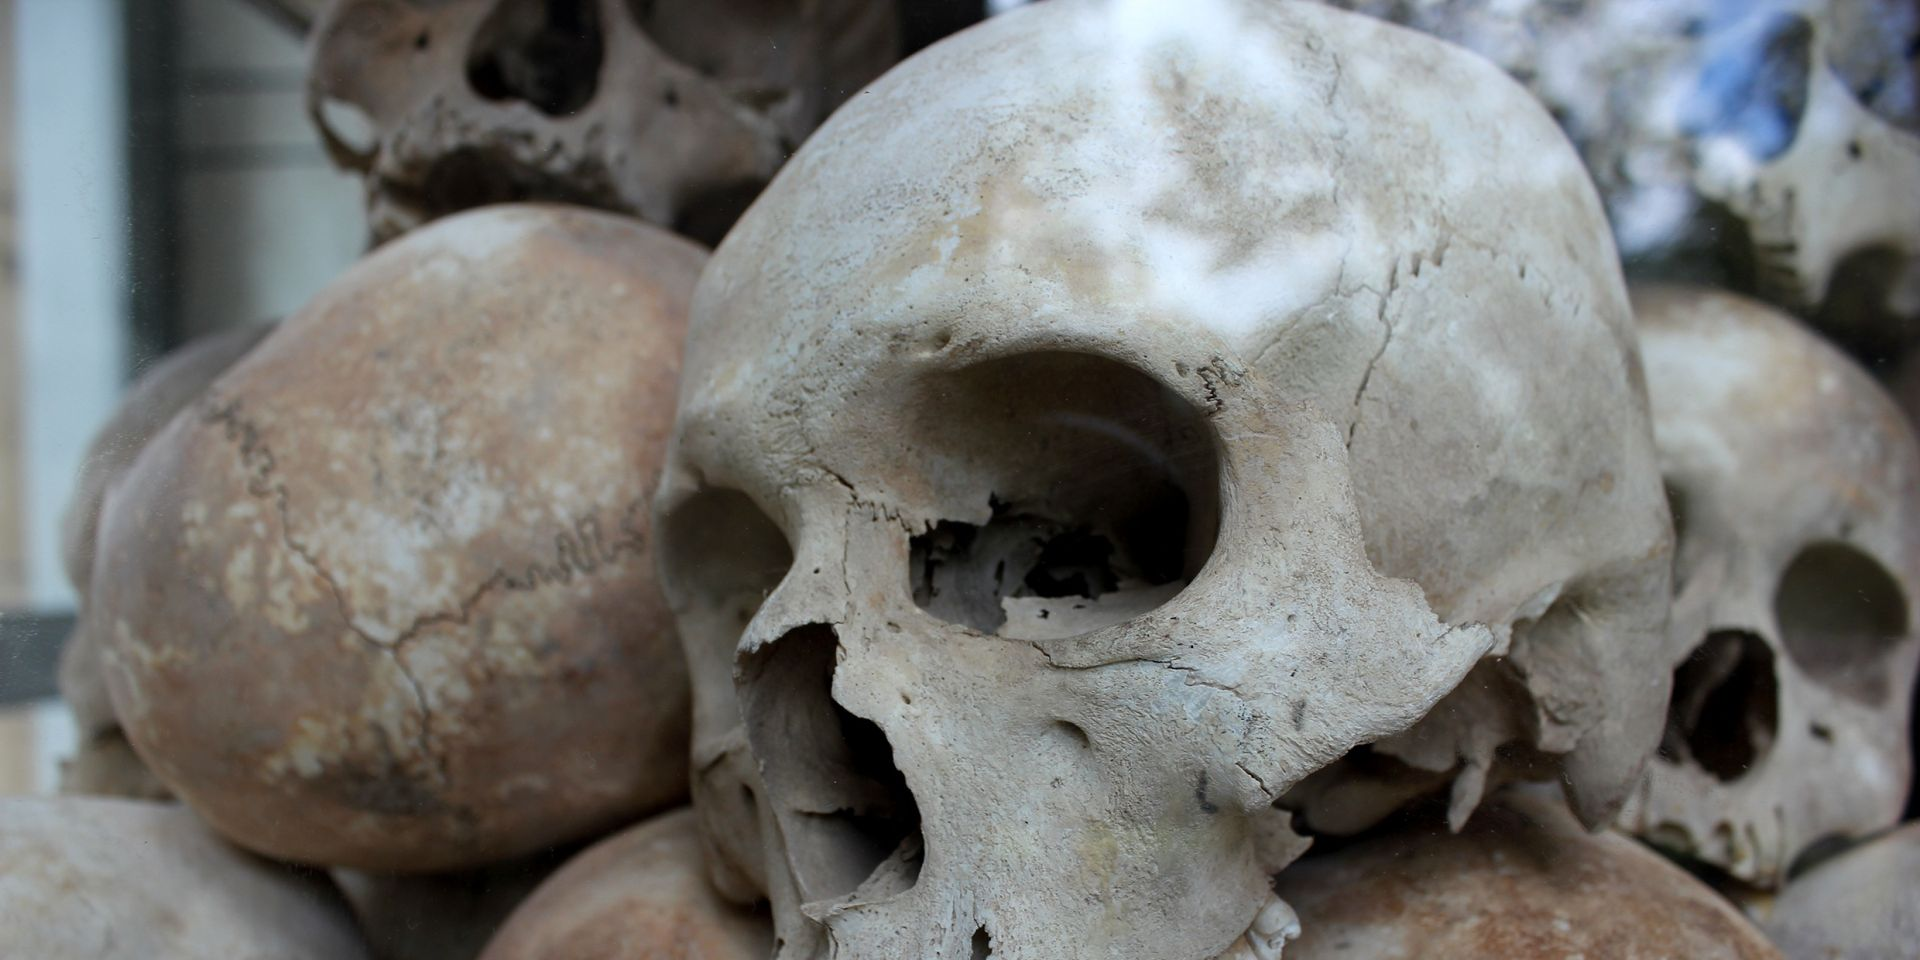 Blizu Faludže pronađena masovna grobnica